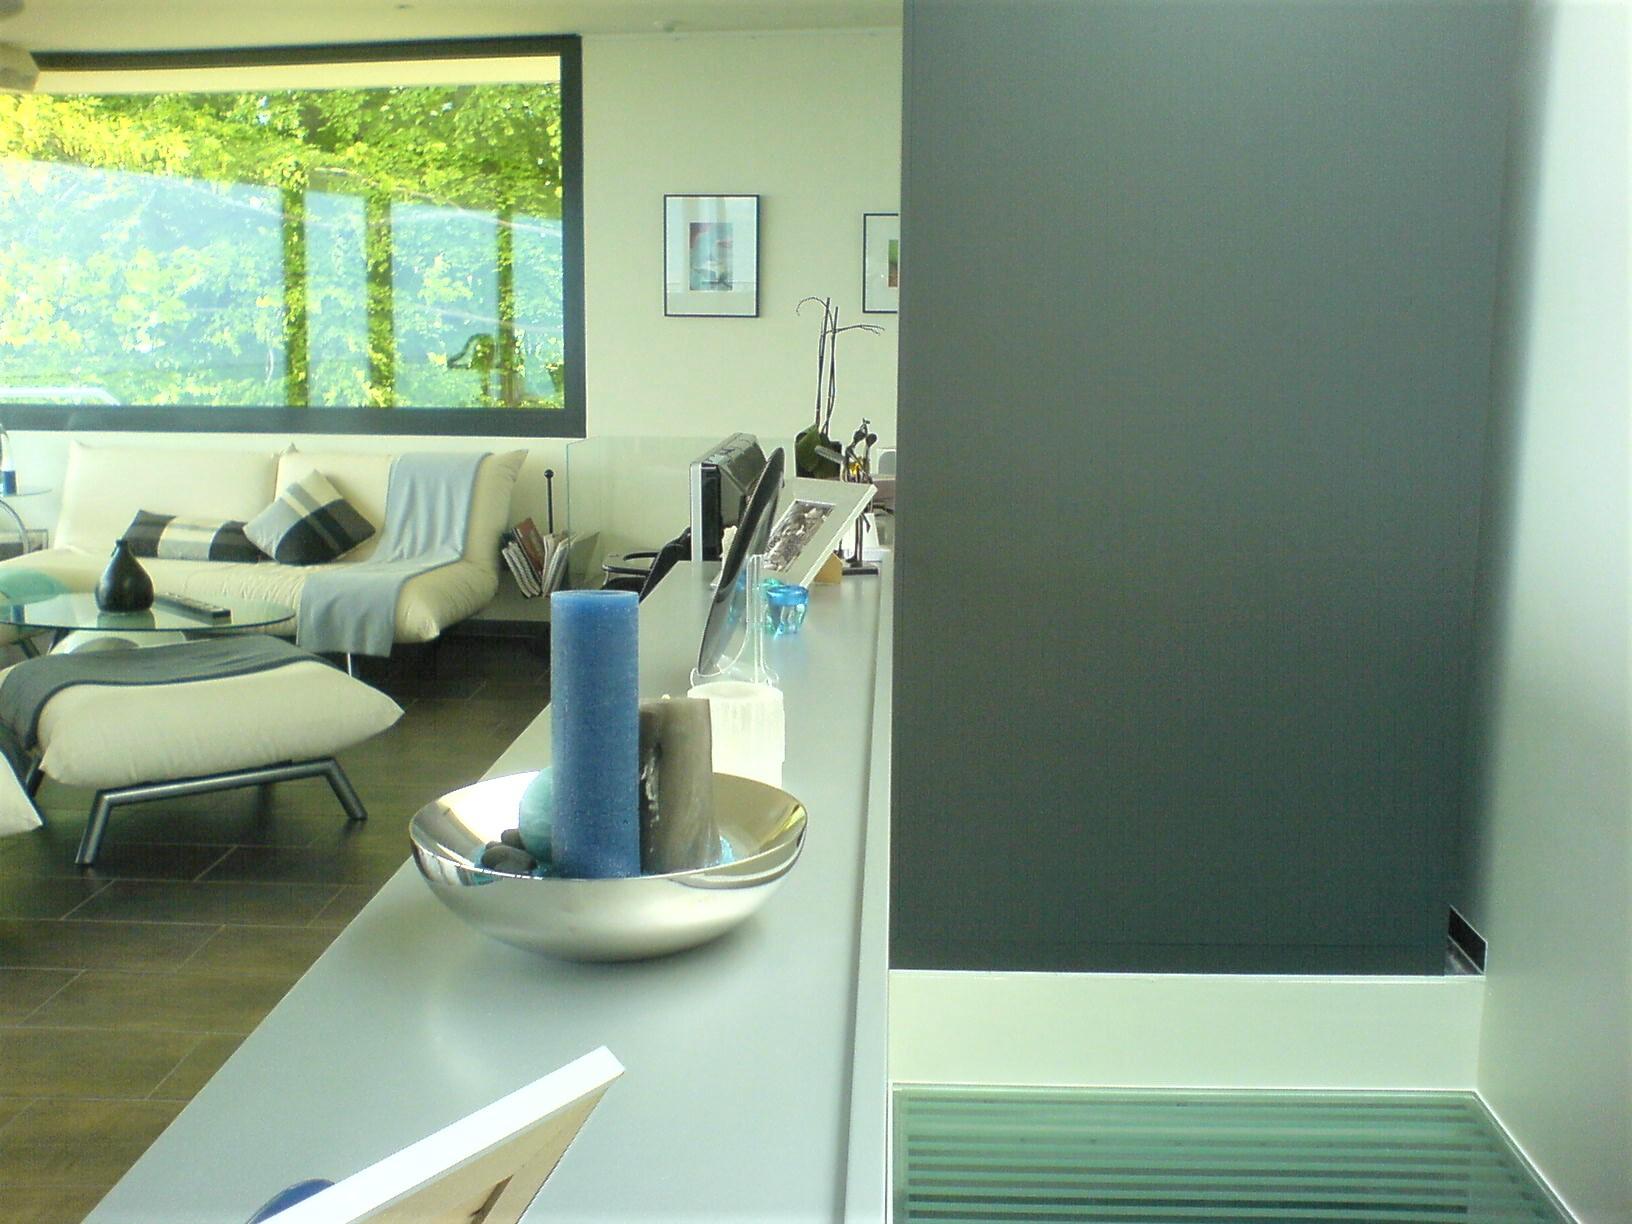 construire son espace feng shui le temps. Black Bedroom Furniture Sets. Home Design Ideas